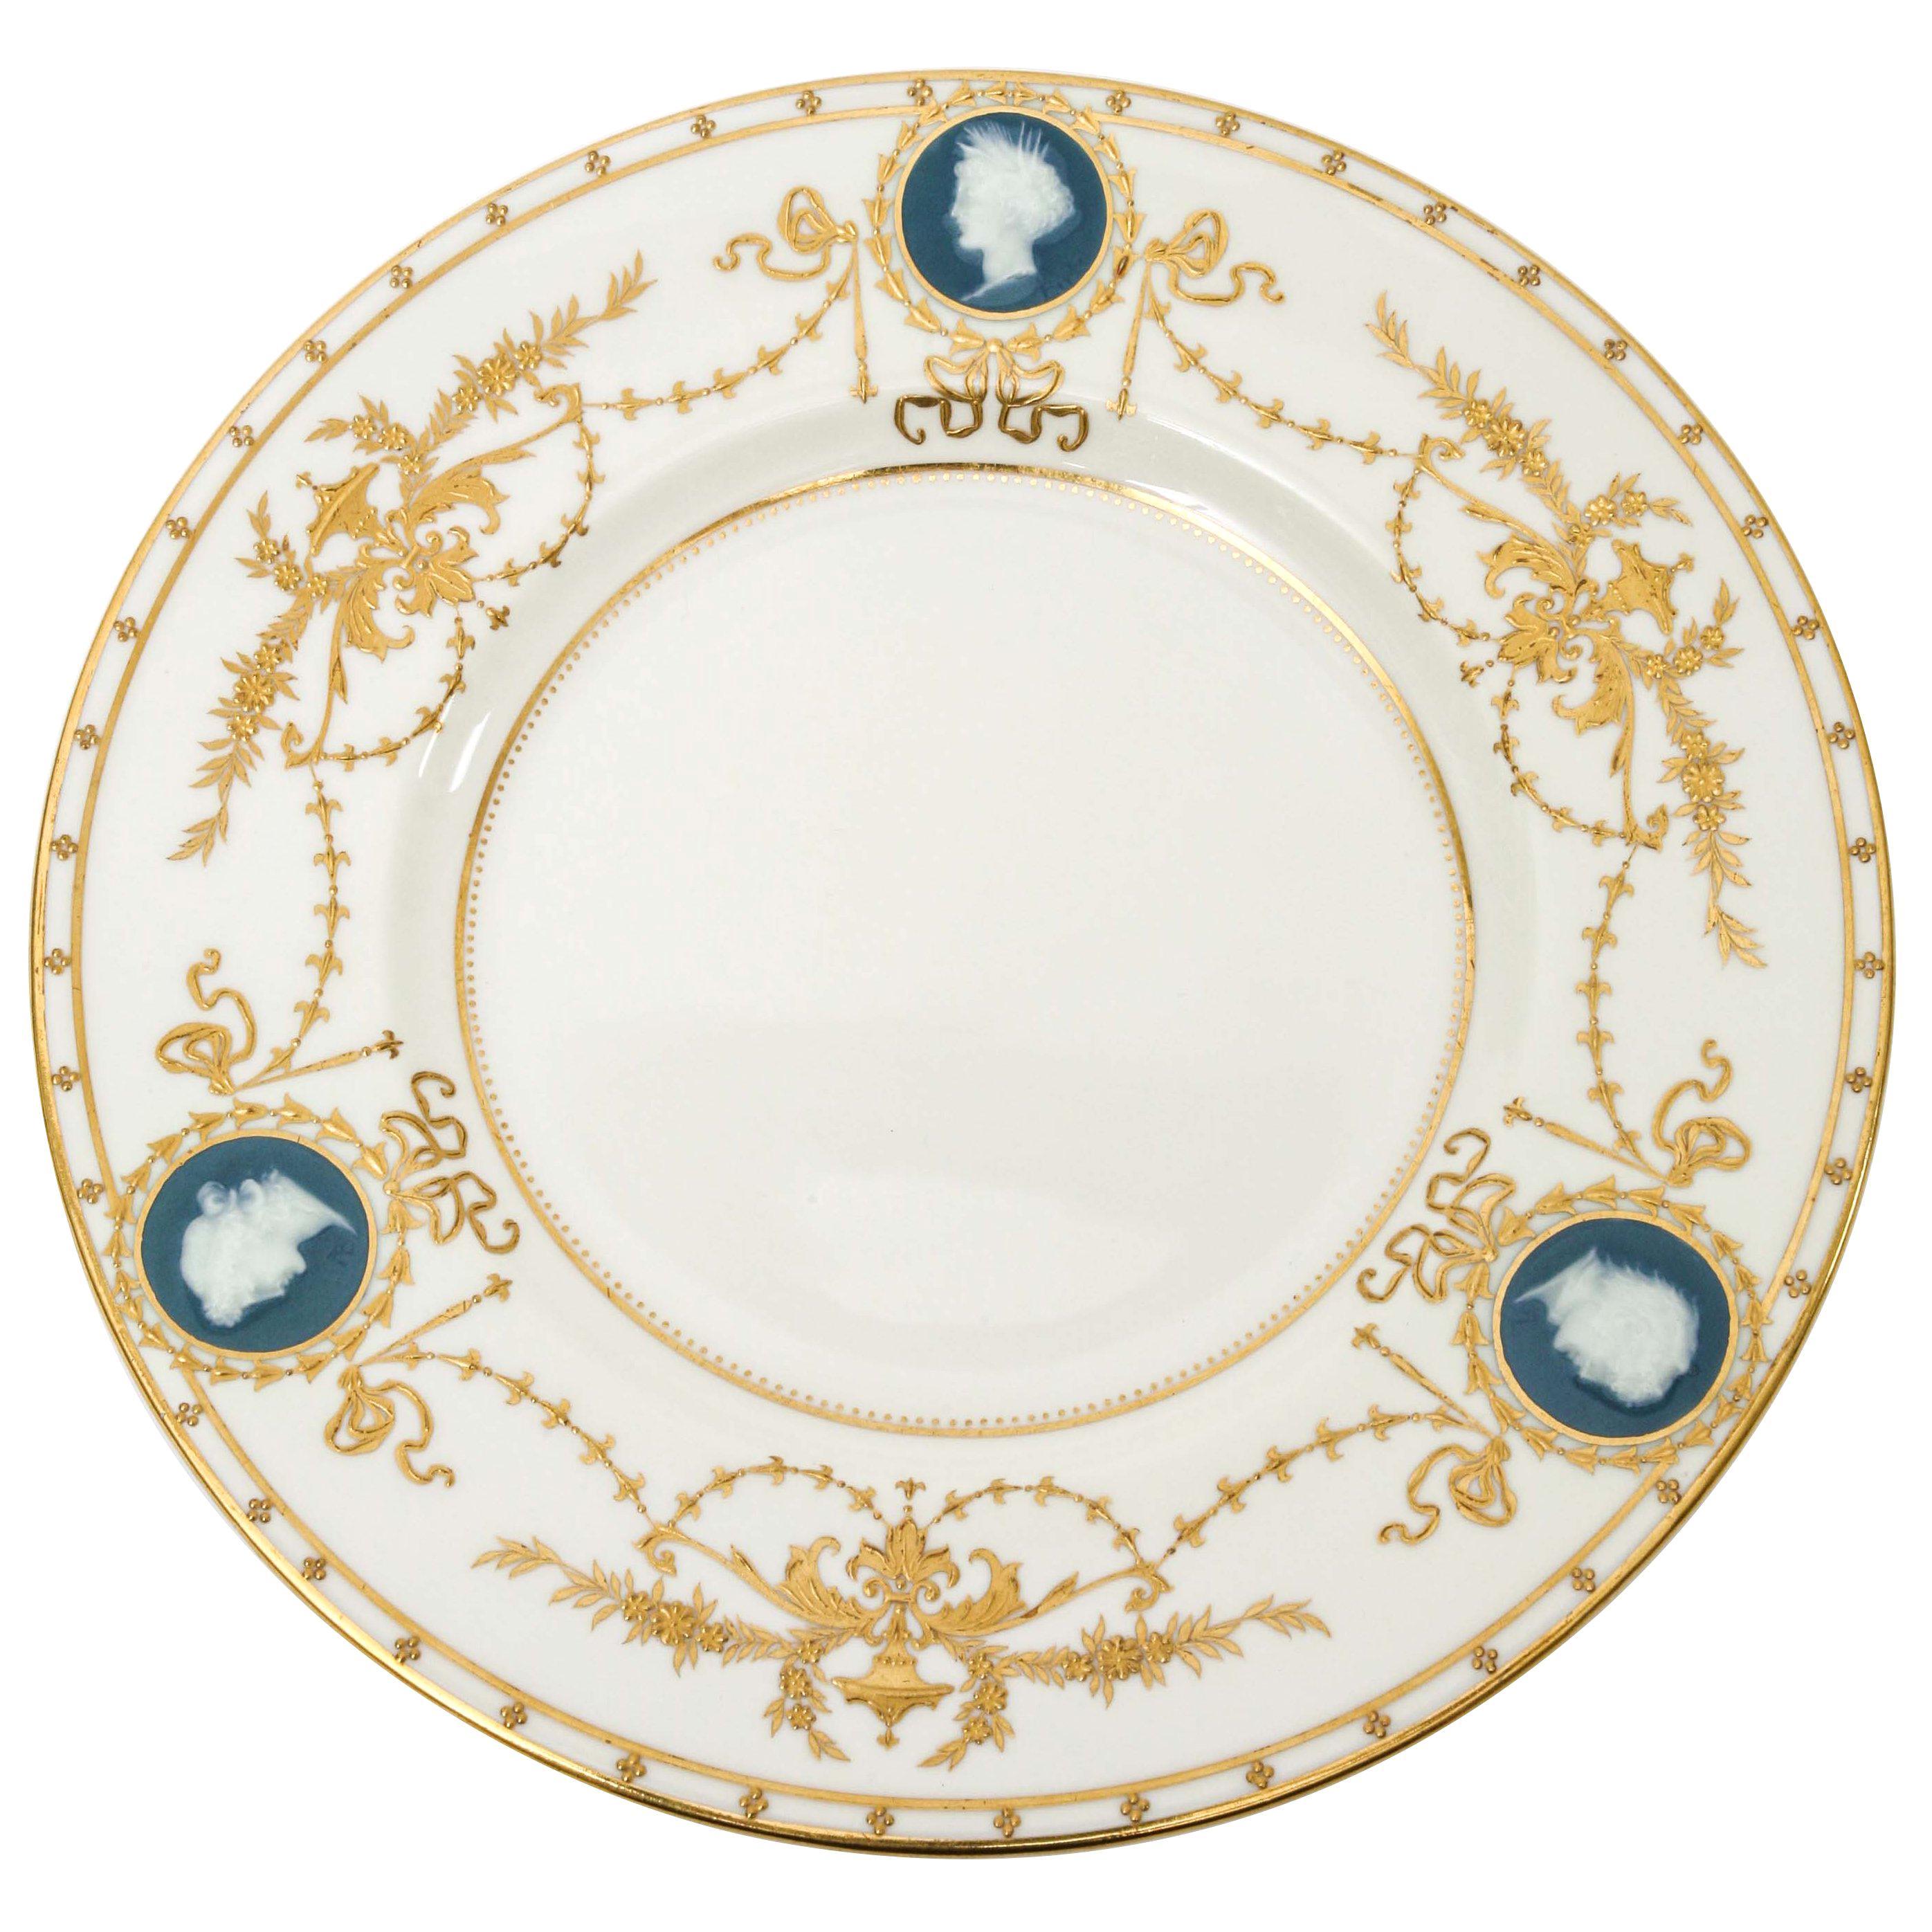 4 Minton for Tiffany Pâte-sur-Pâte Signed Alboin Birks Plates, Raised Gilding